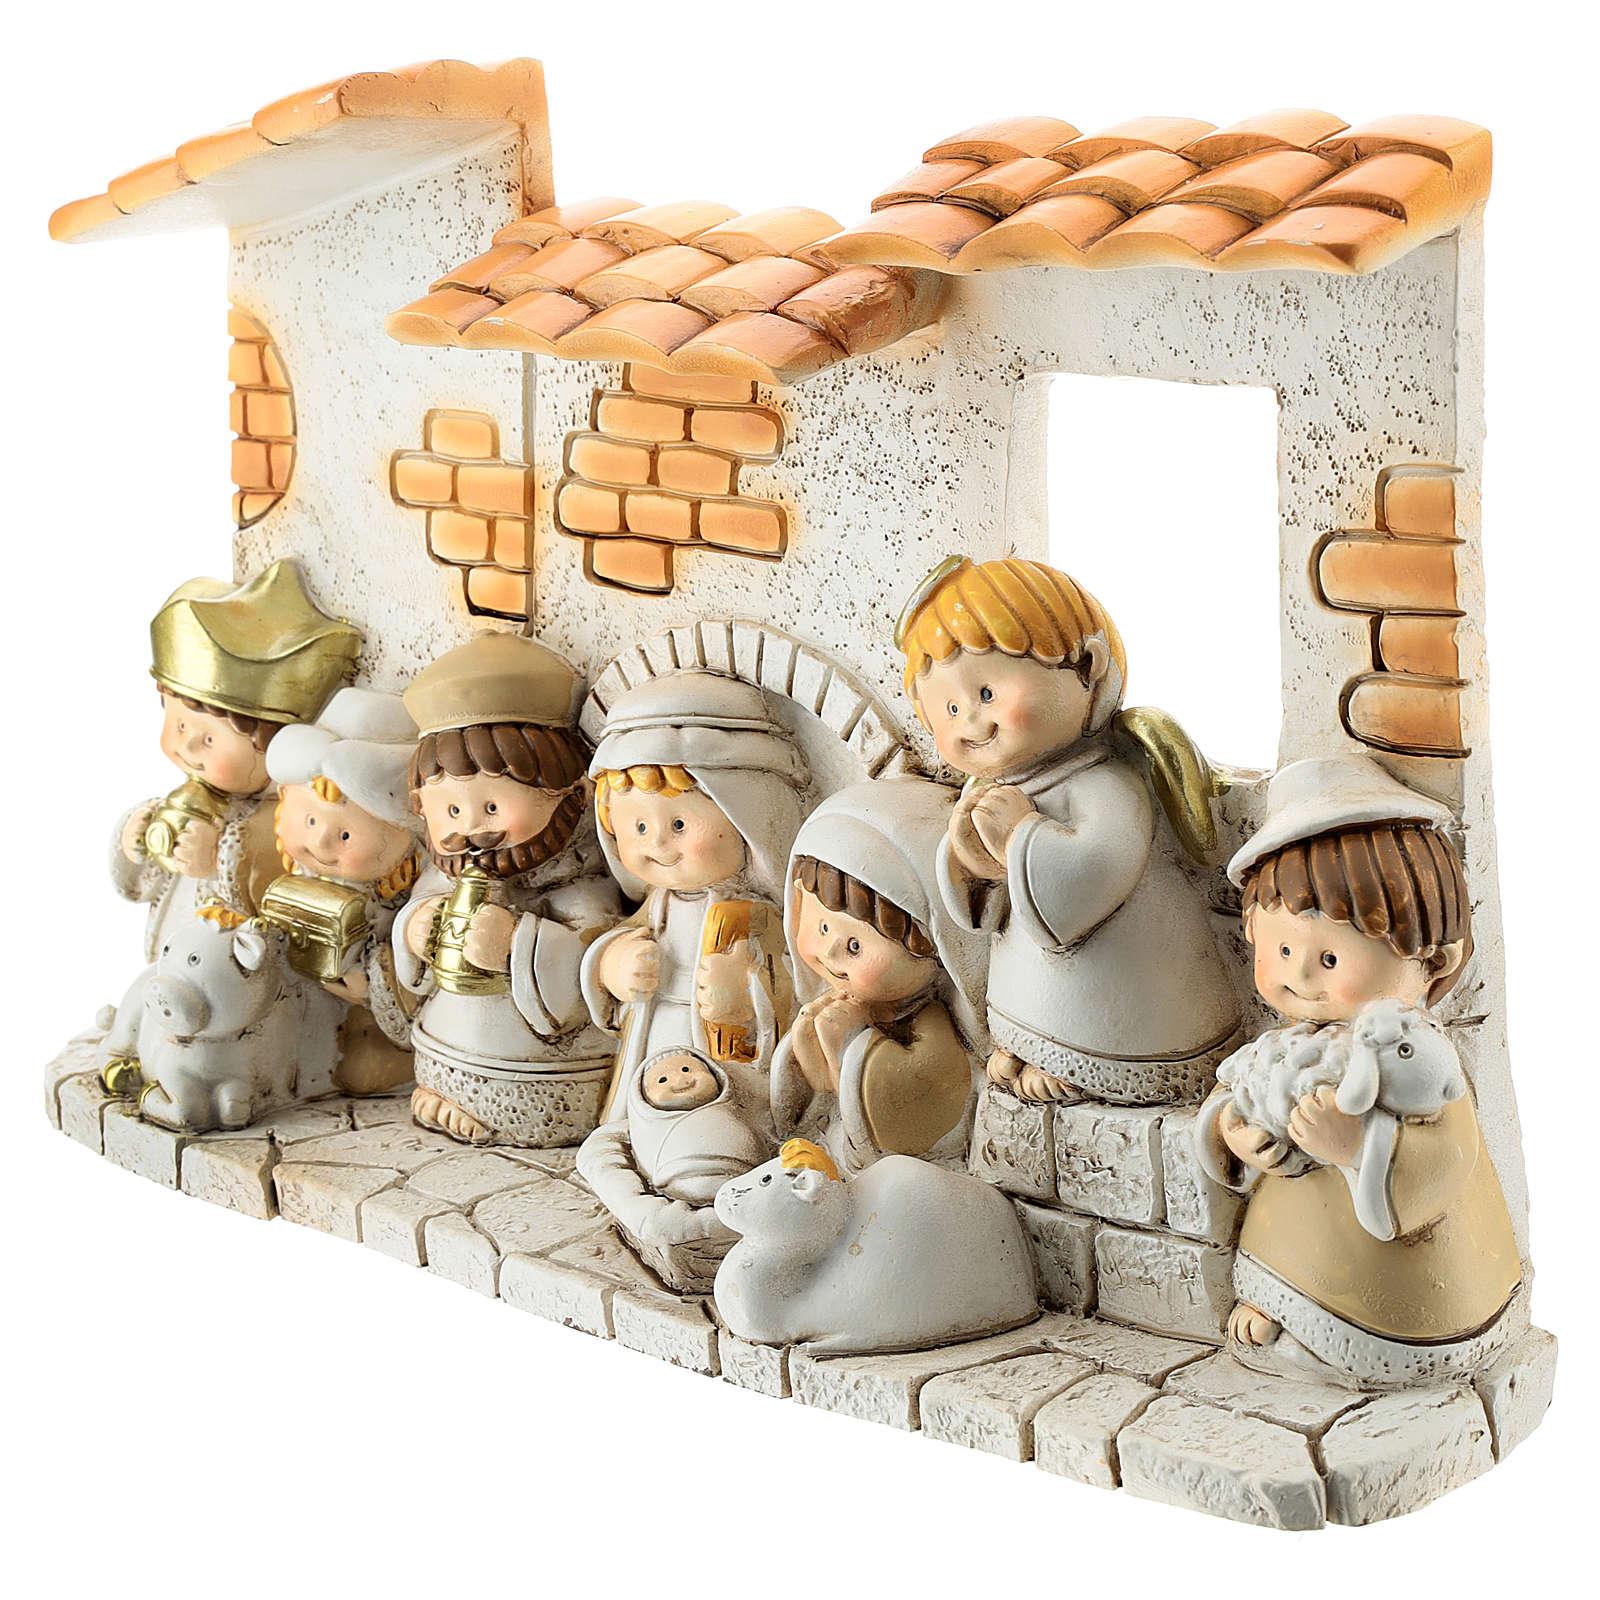 Belén caserío resina 10 personajes 10x15 cm línea niños 4